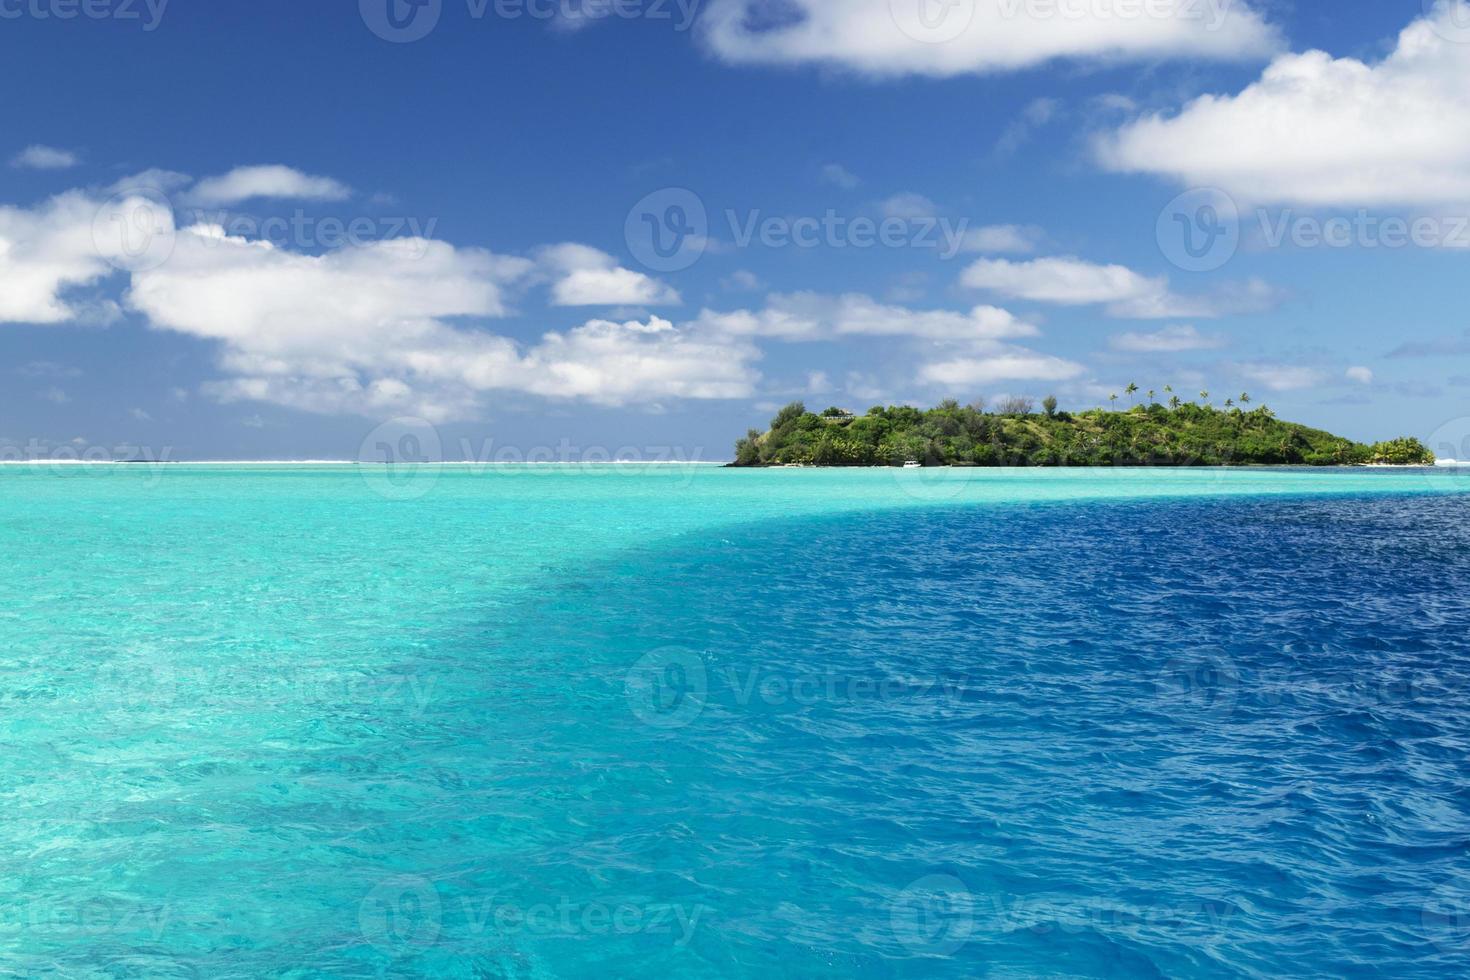 bora bora aqua e água azul foto